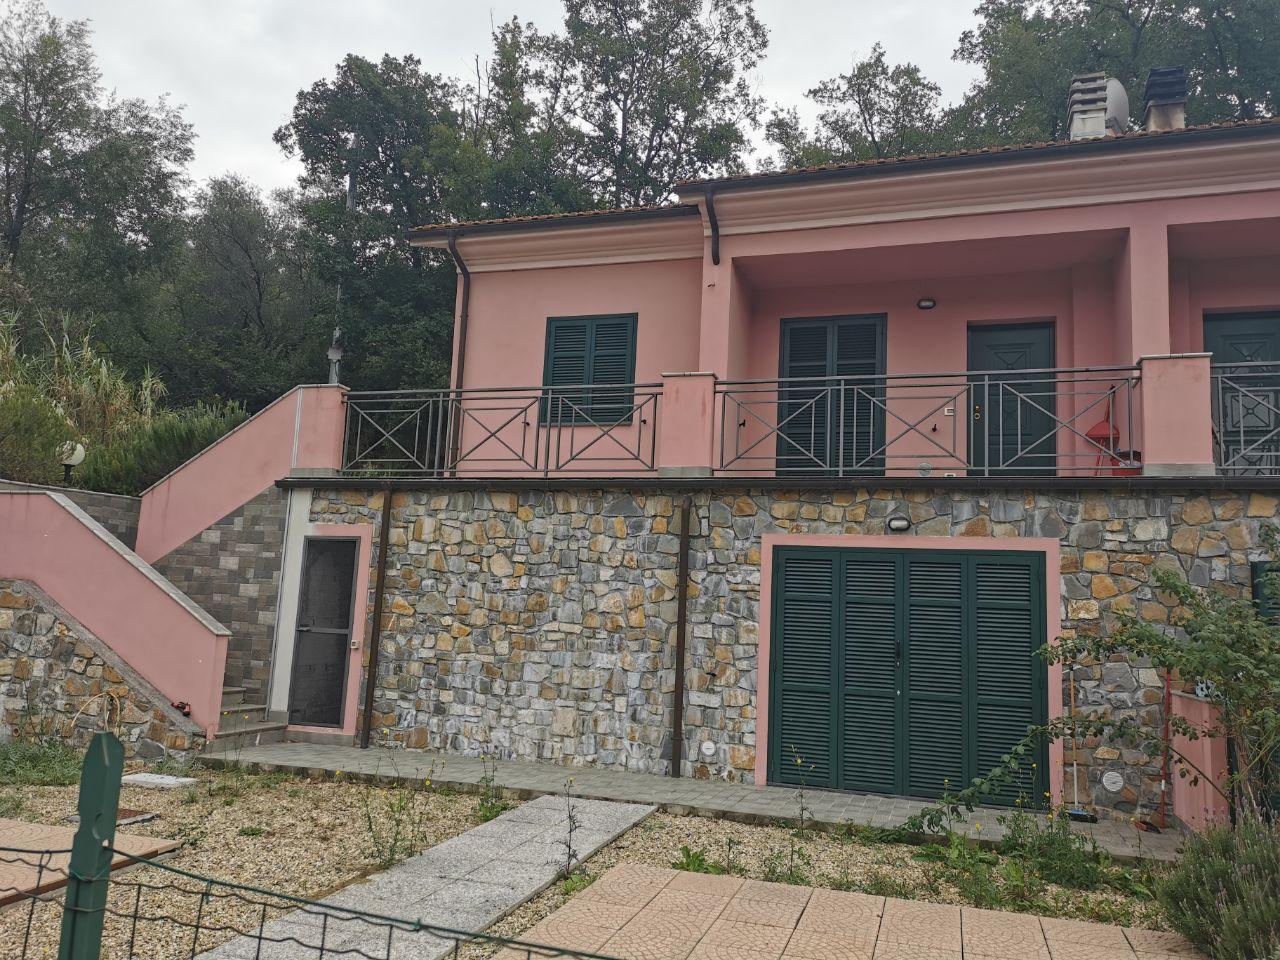 Townhouse with garden in Chiusanico, Imperia